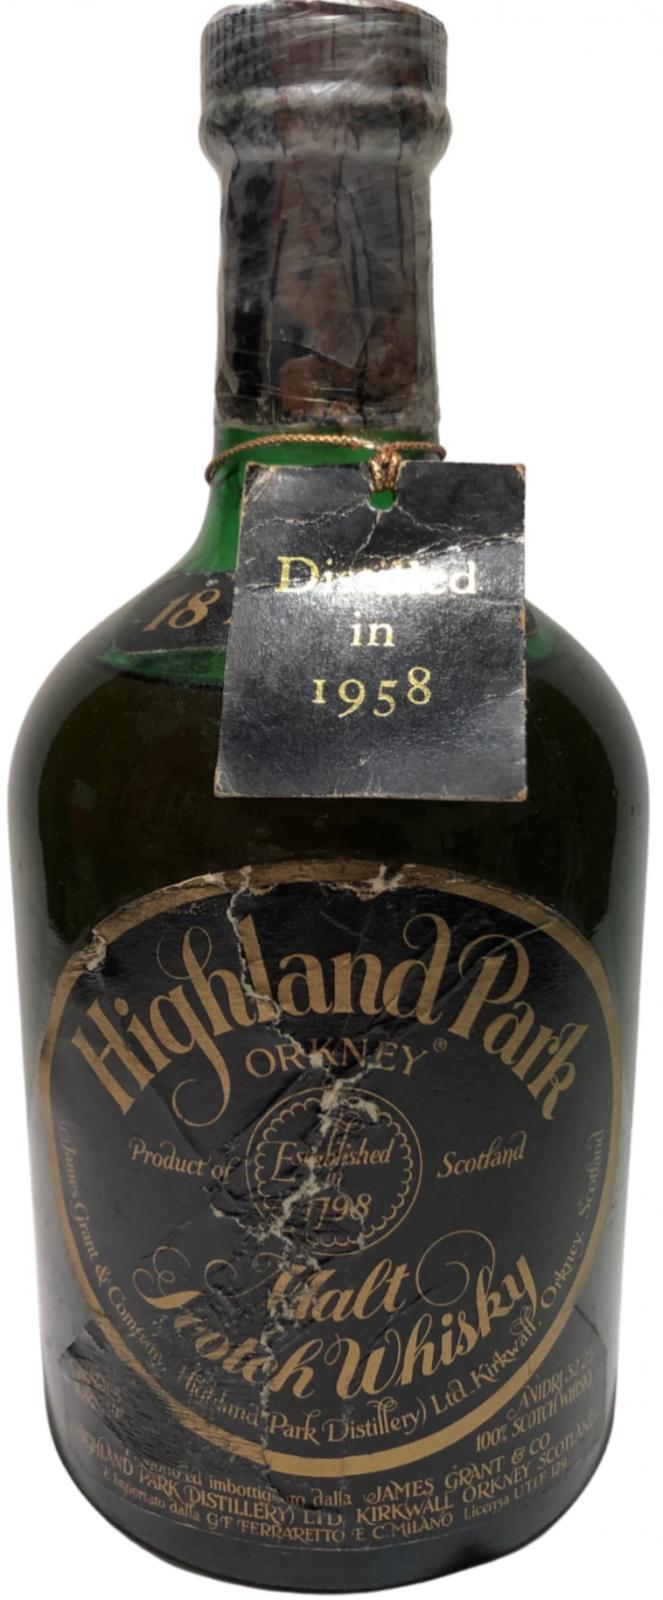 Highland Park 1958